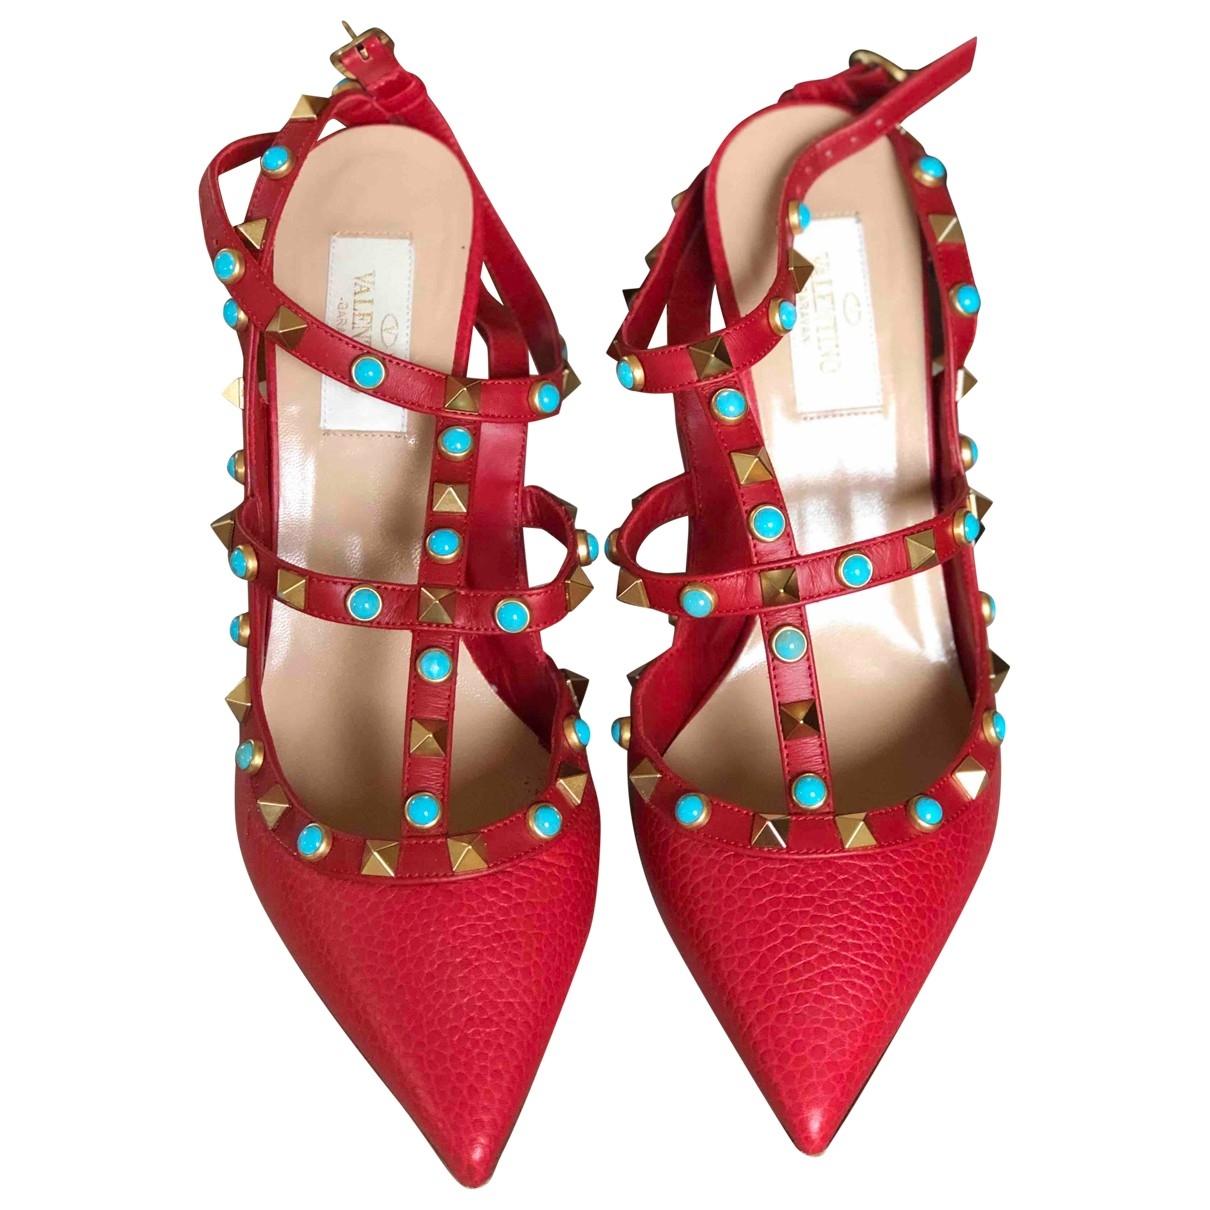 Valentino Garavani Rockstud Red Leather Heels for Women 38 EU